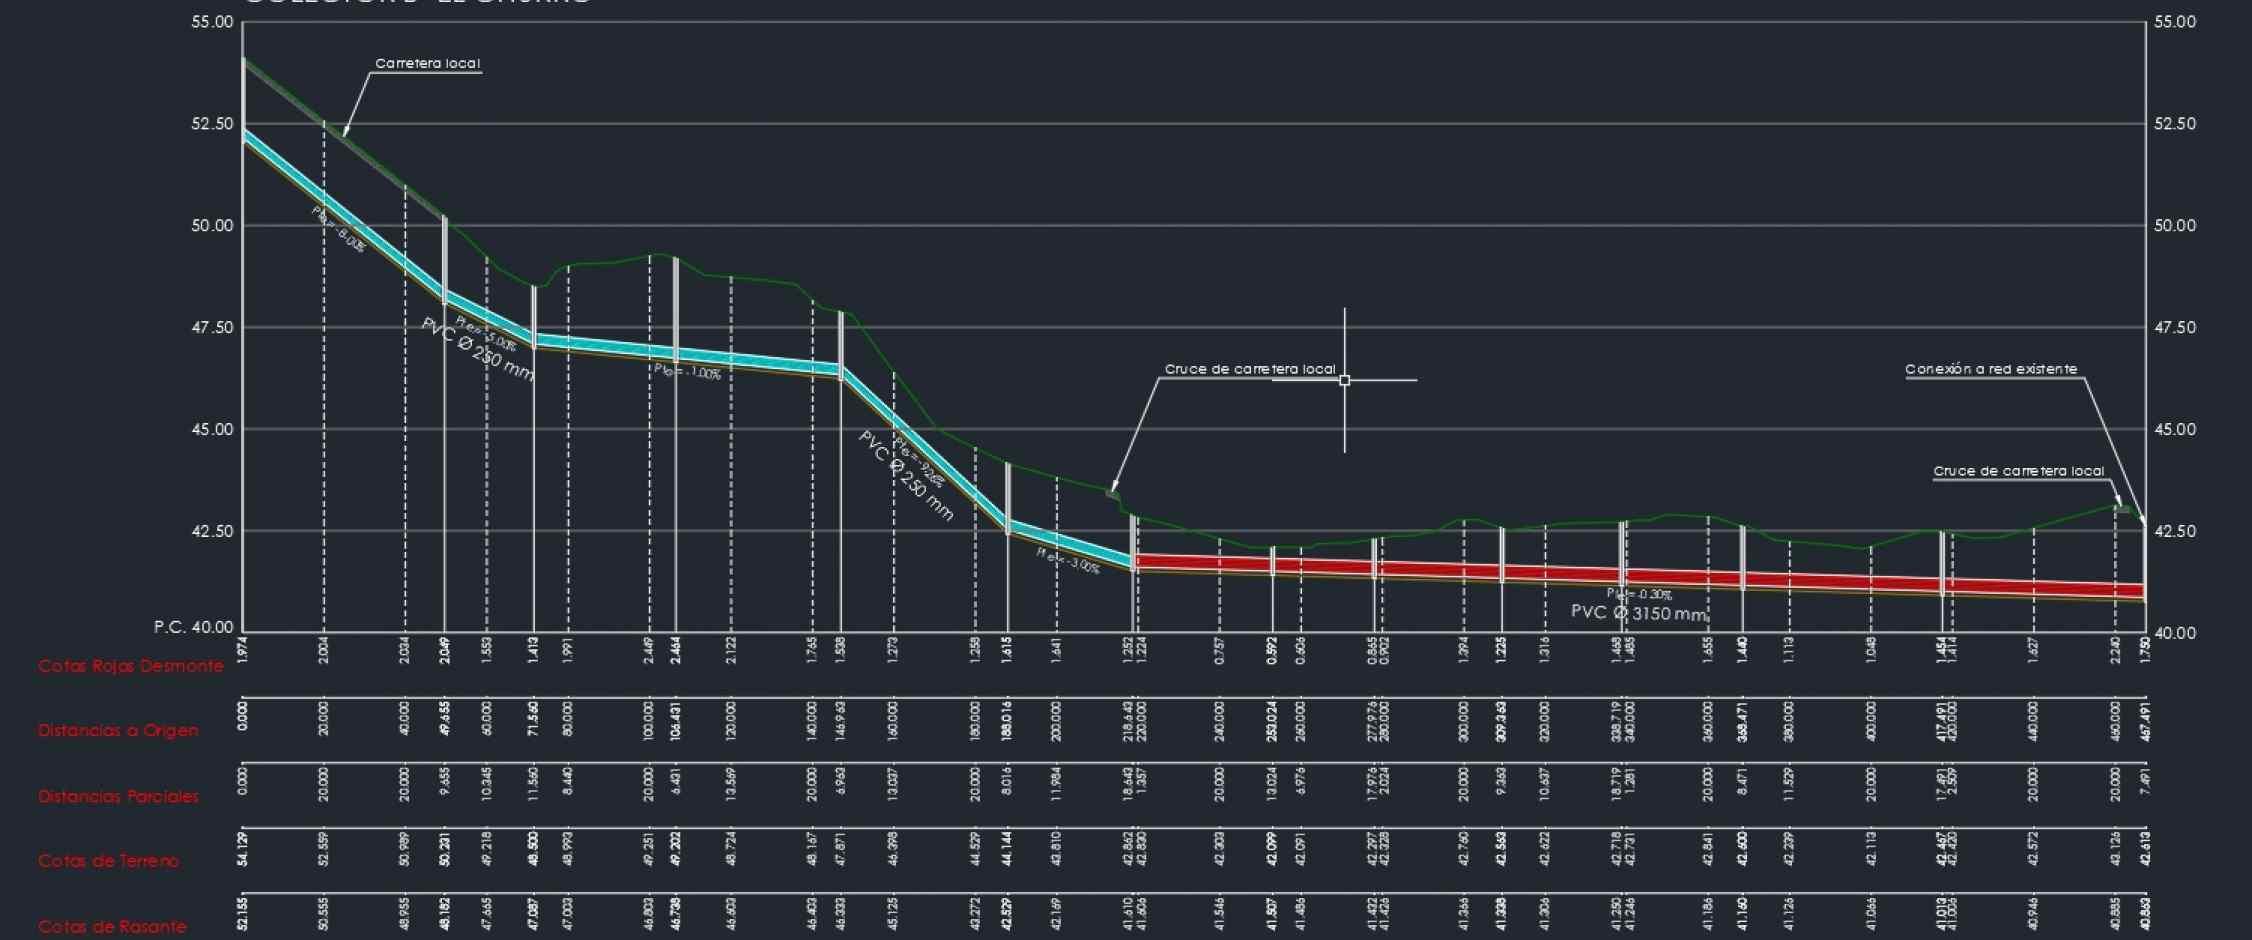 Perfil longitudinal de canalización